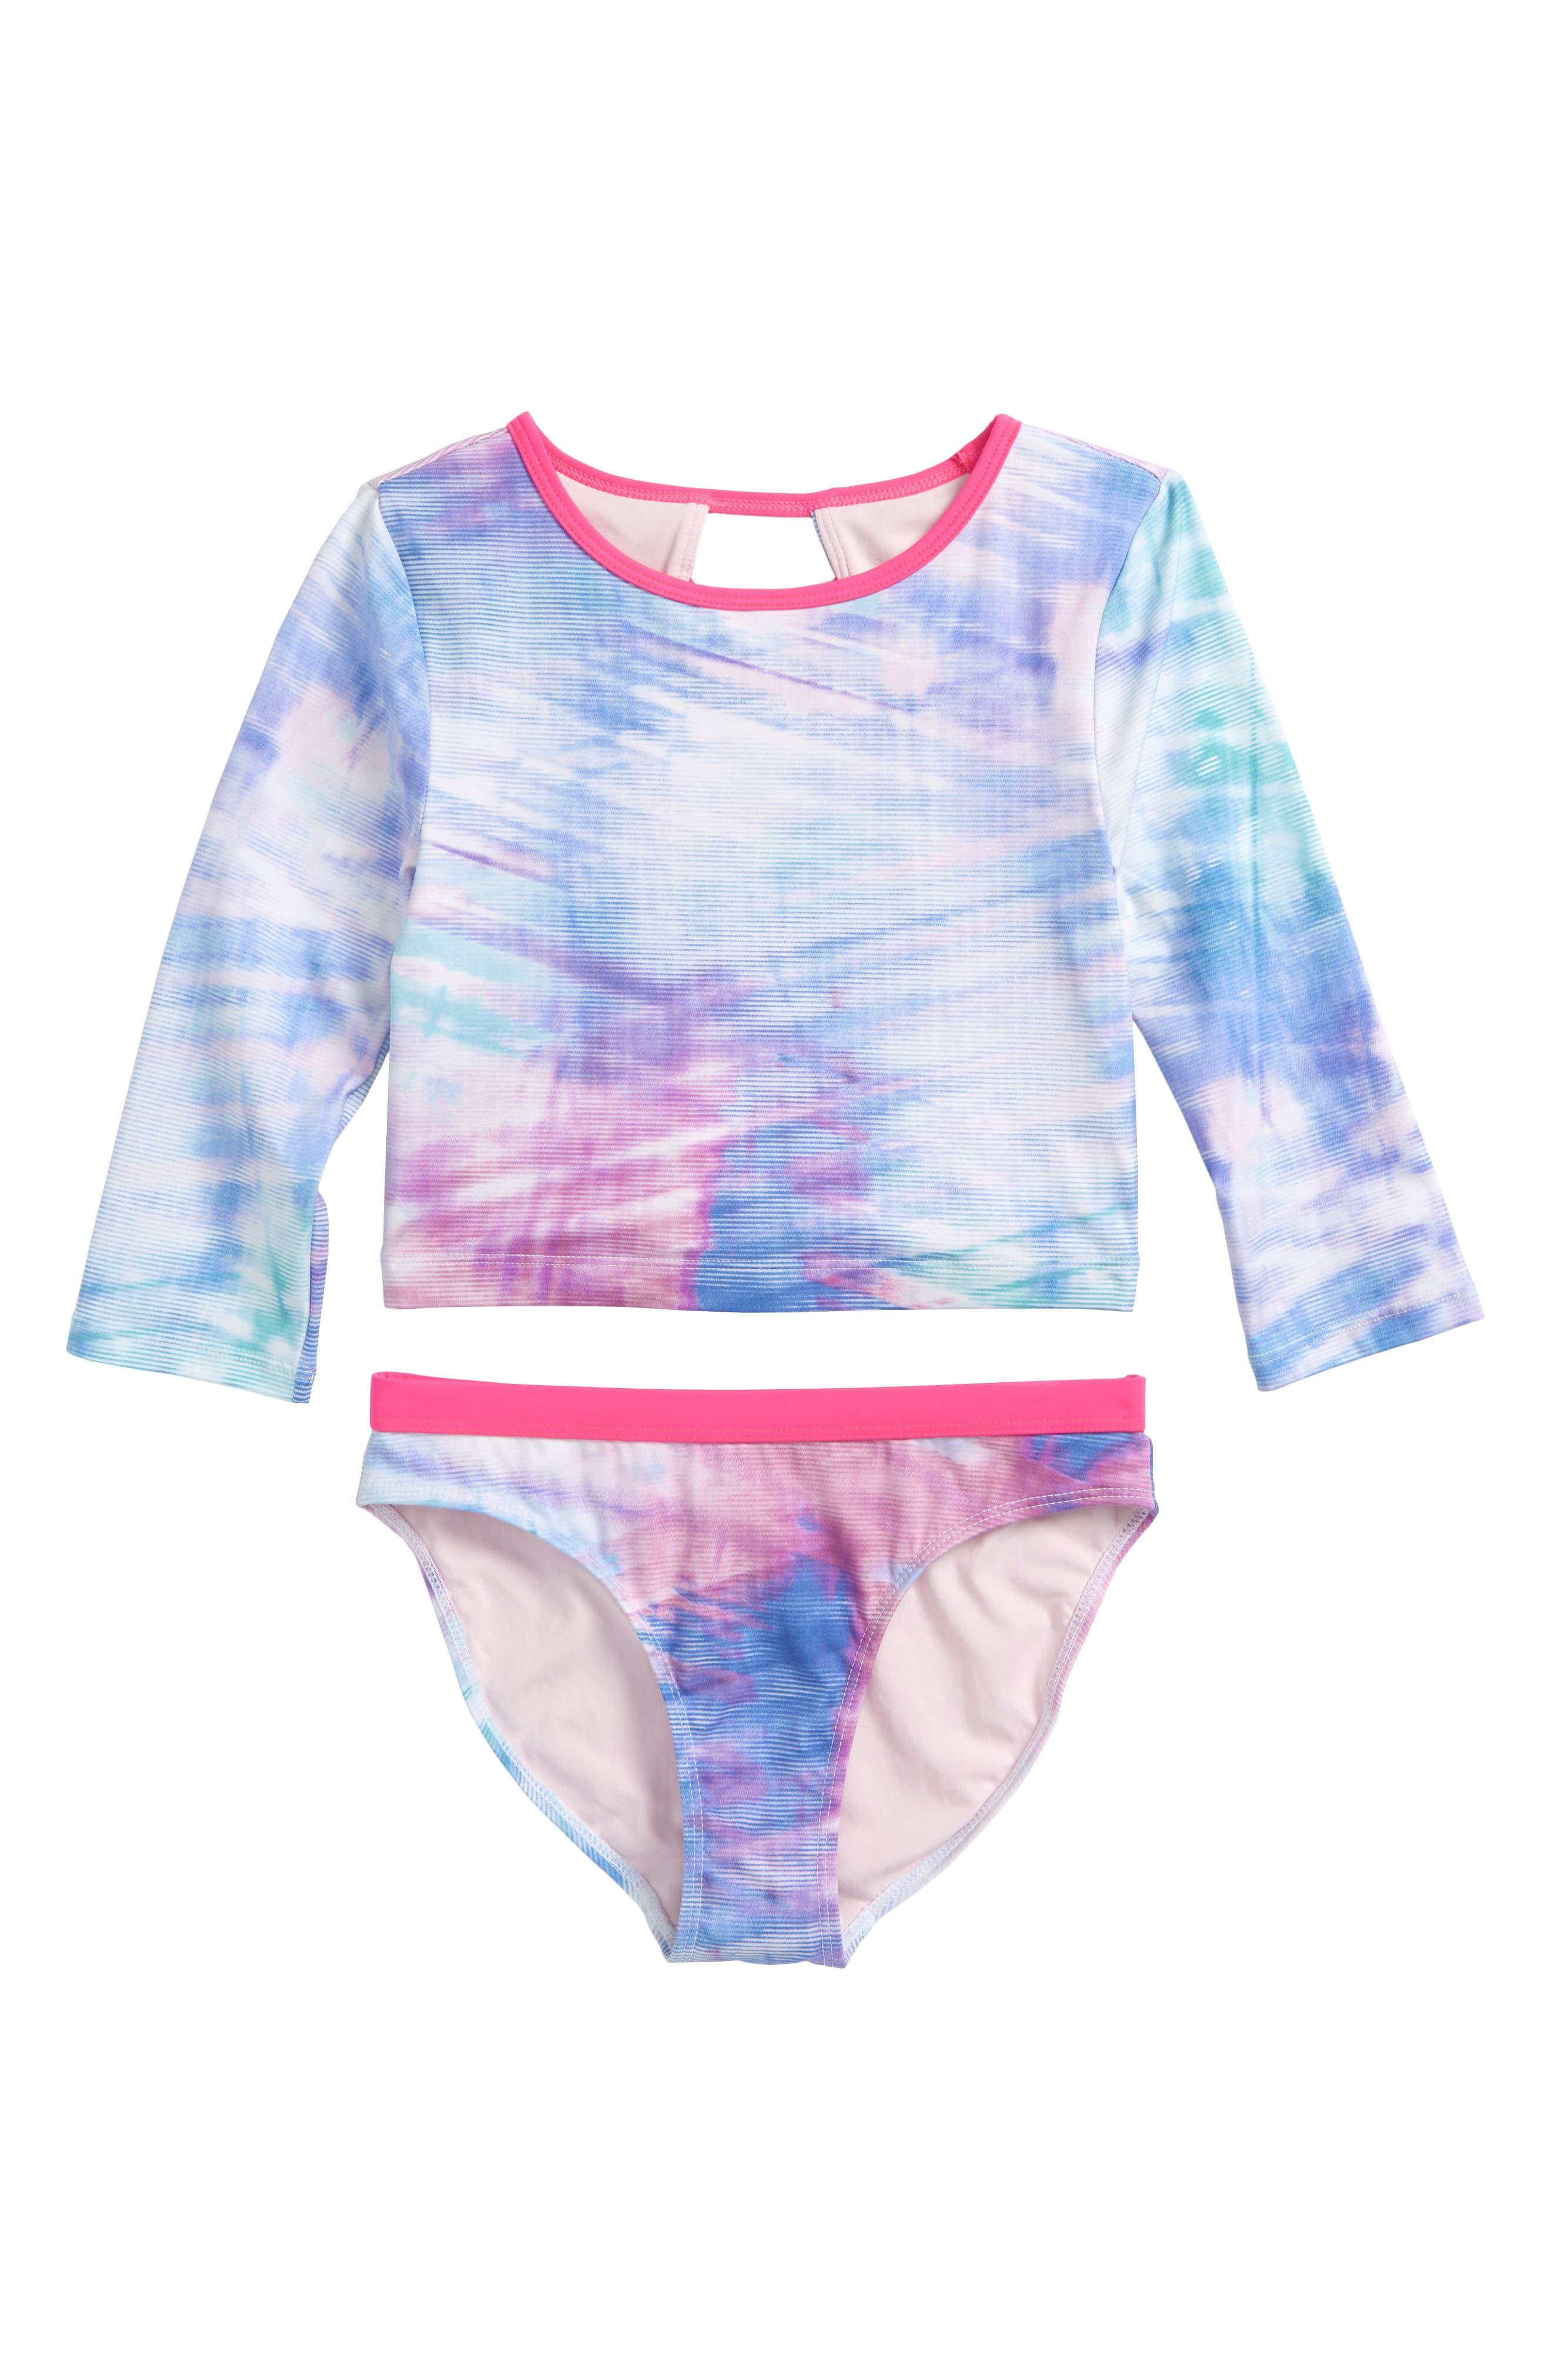 Scoop Two-Piece Rashguard Swimsuit,                             Main thumbnail 2, color,